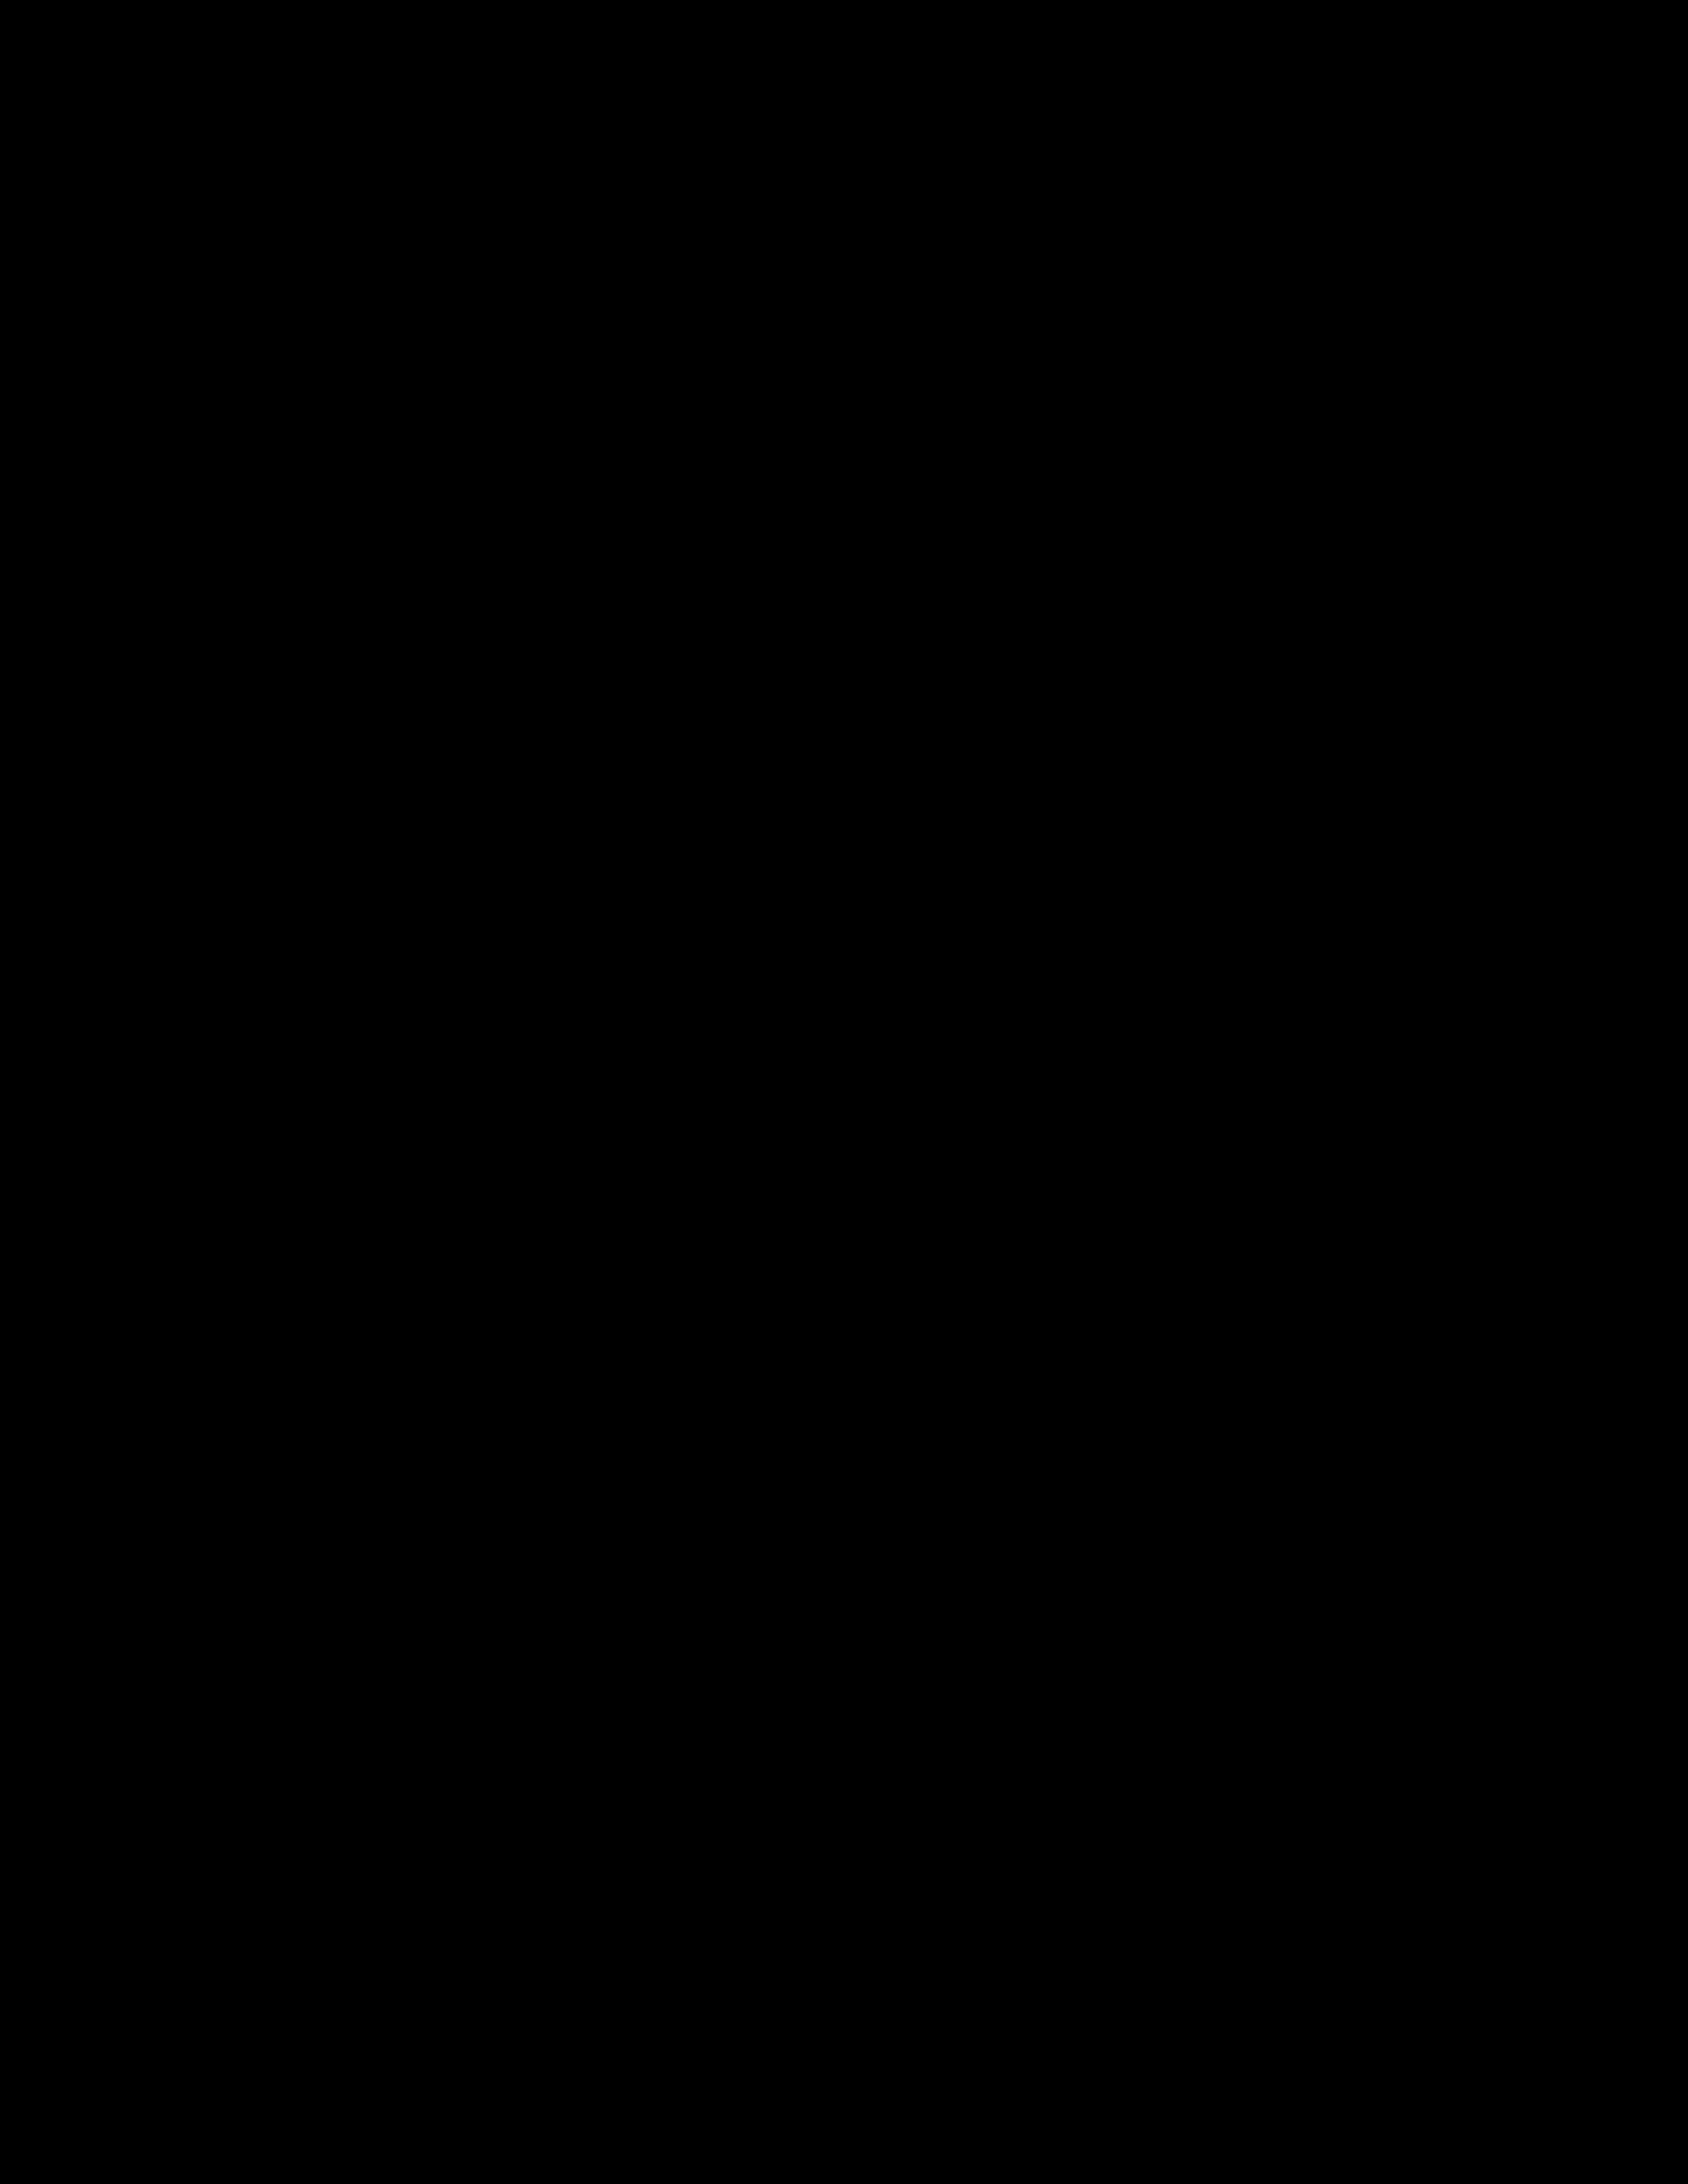 BEACON FLASHLIGHT TÉLÉCHARGER